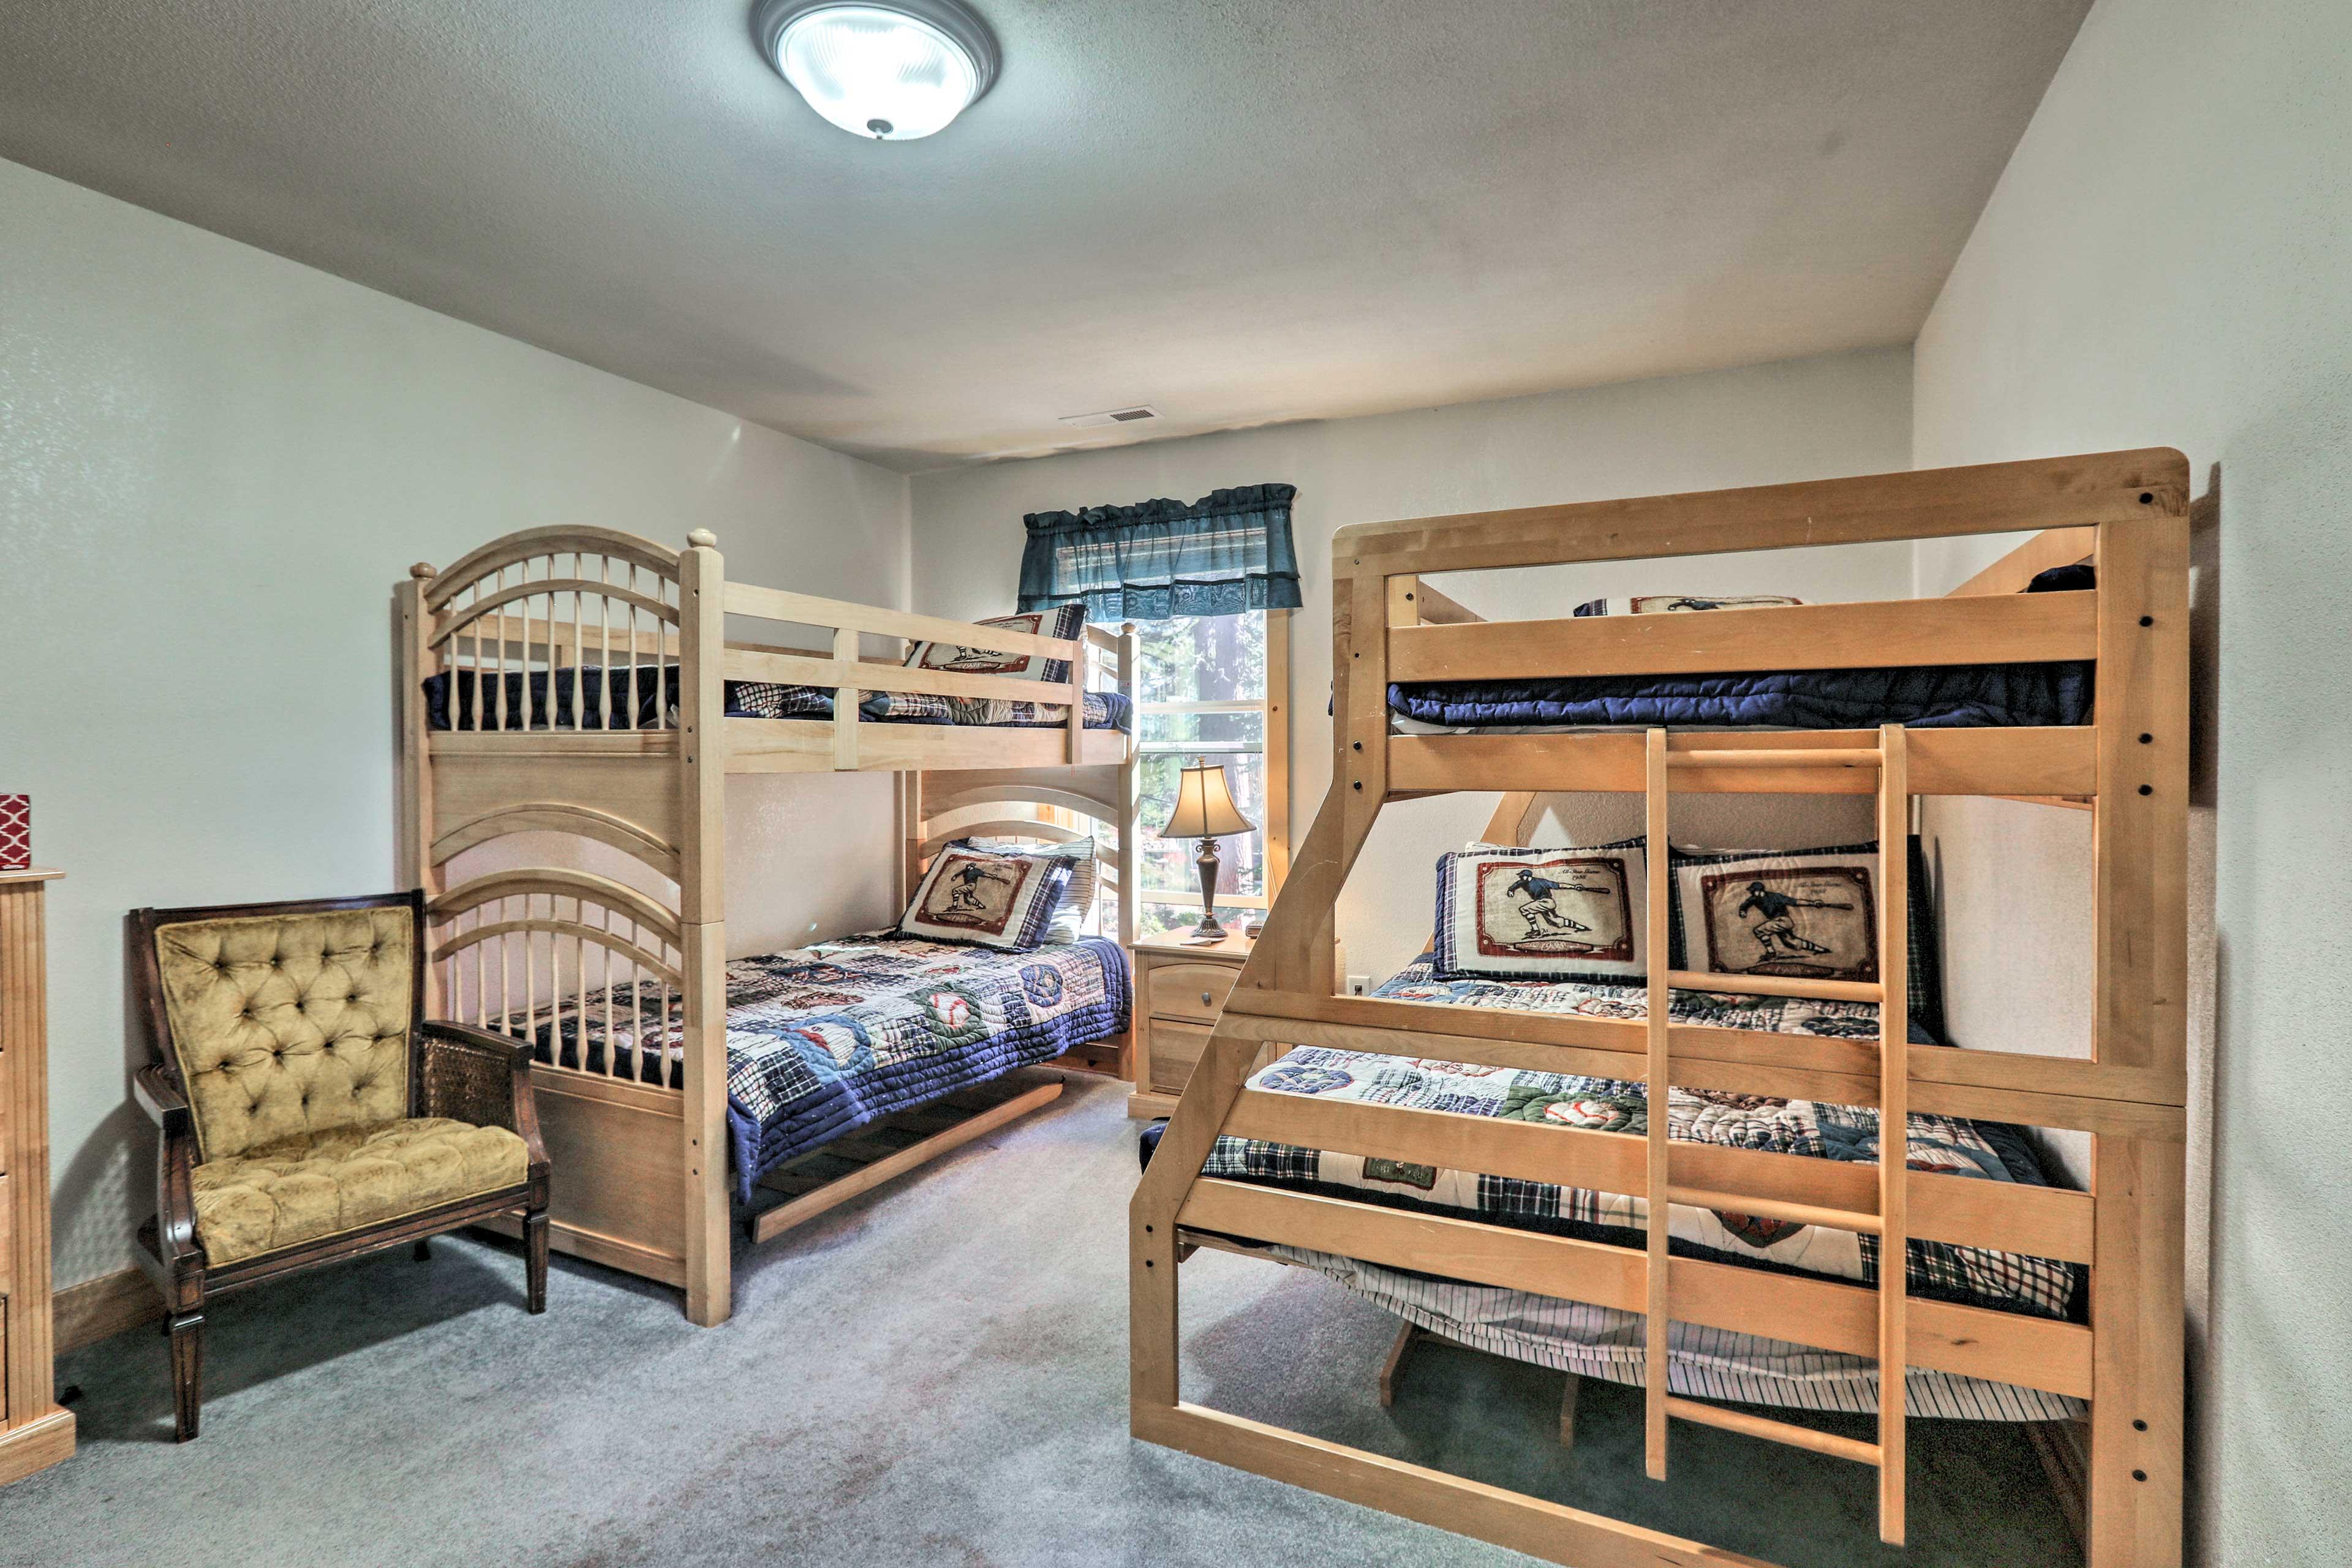 Kids love the third bunk room!